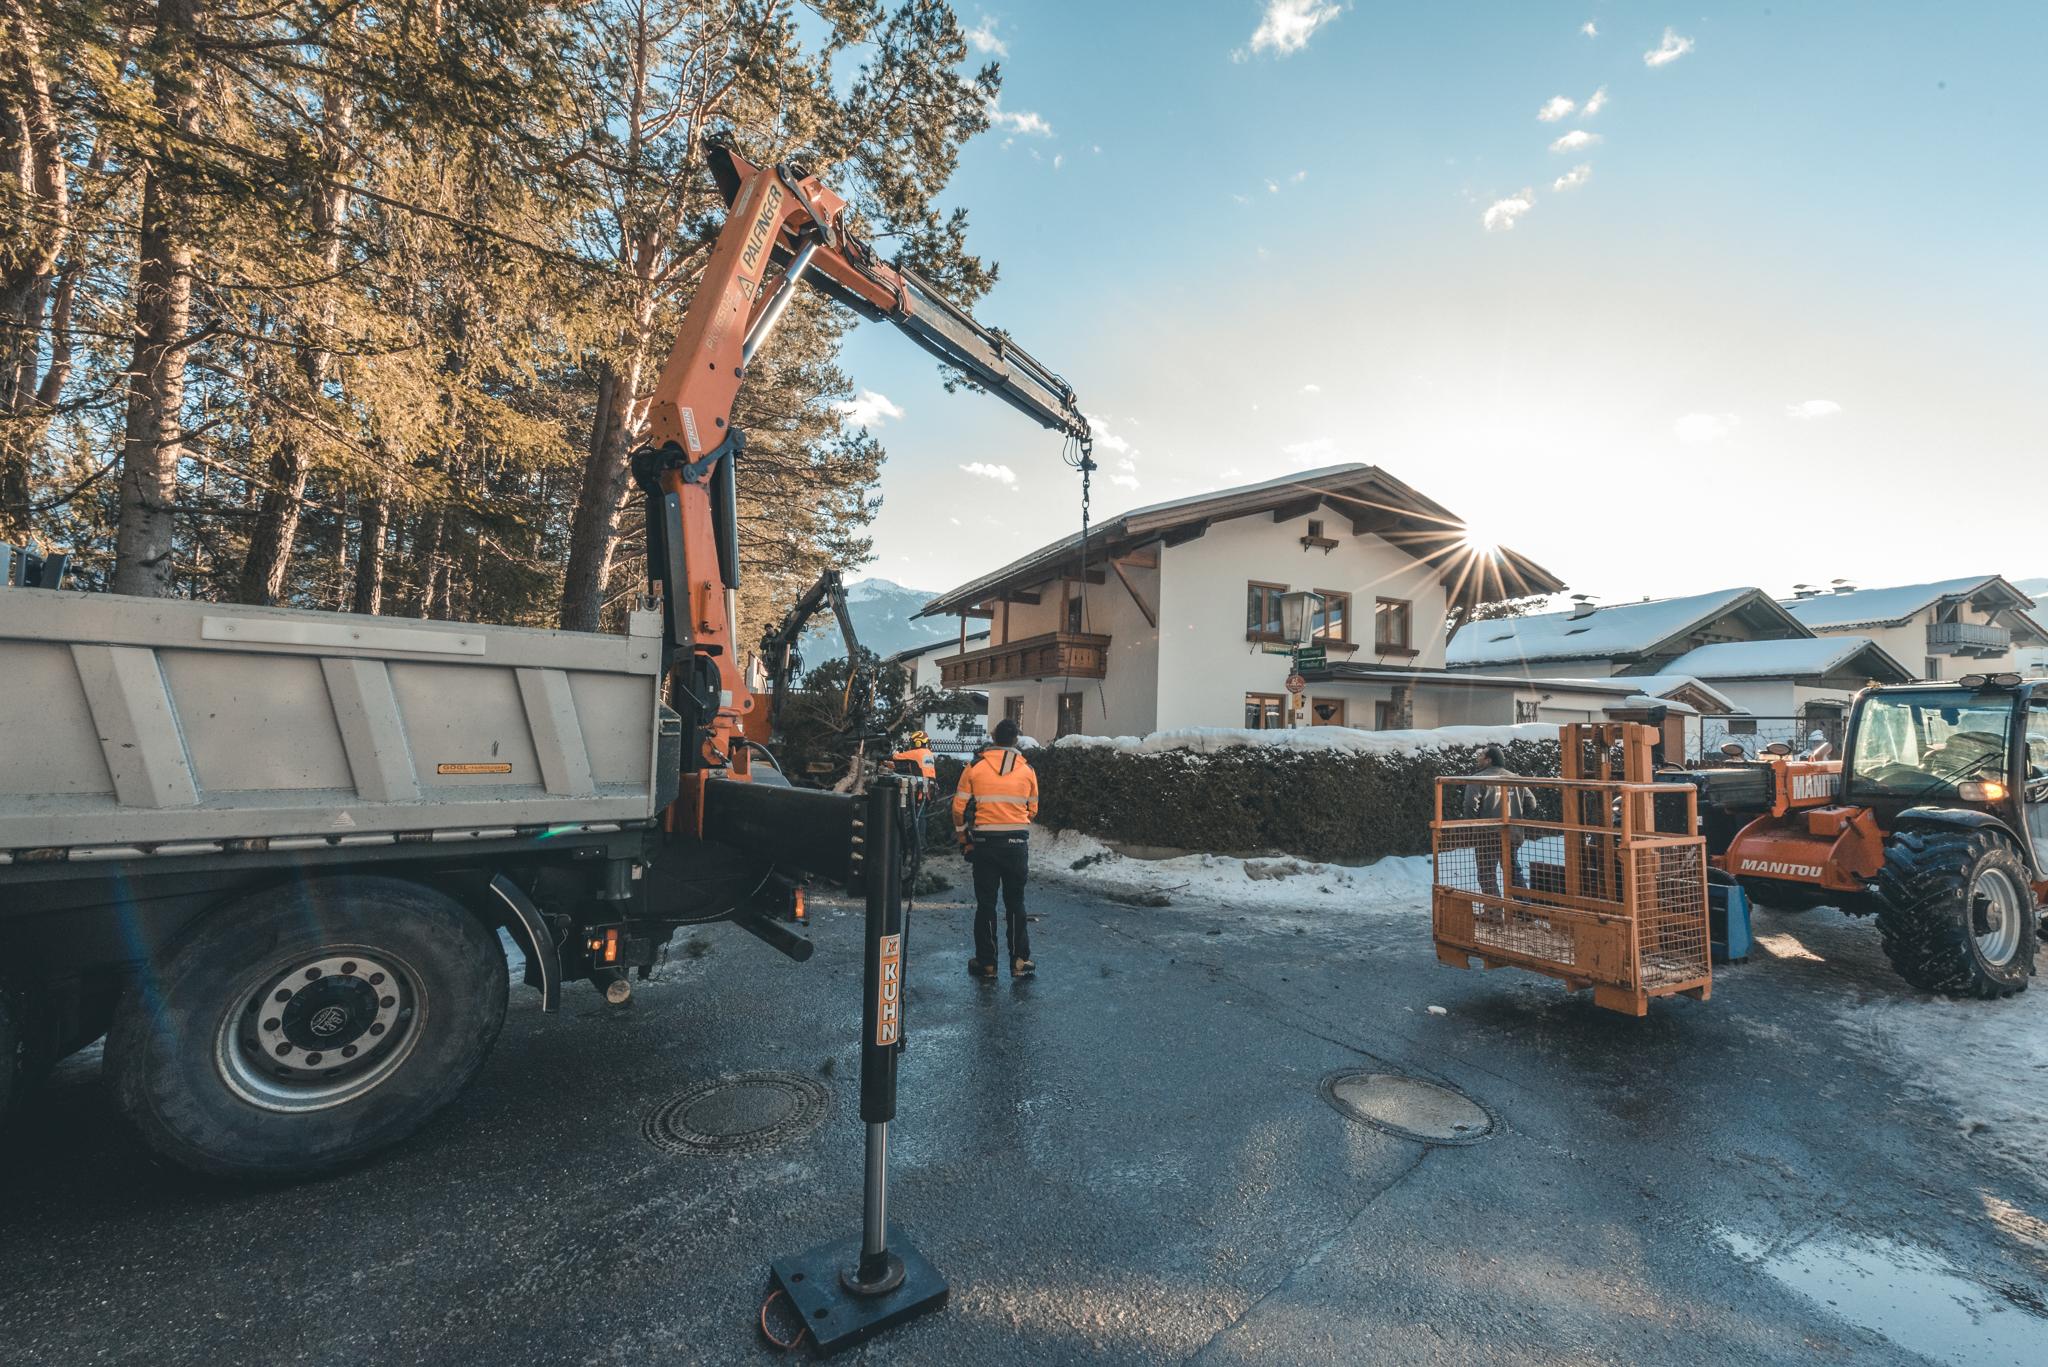 Problemholzfällung Siedlung Barwies